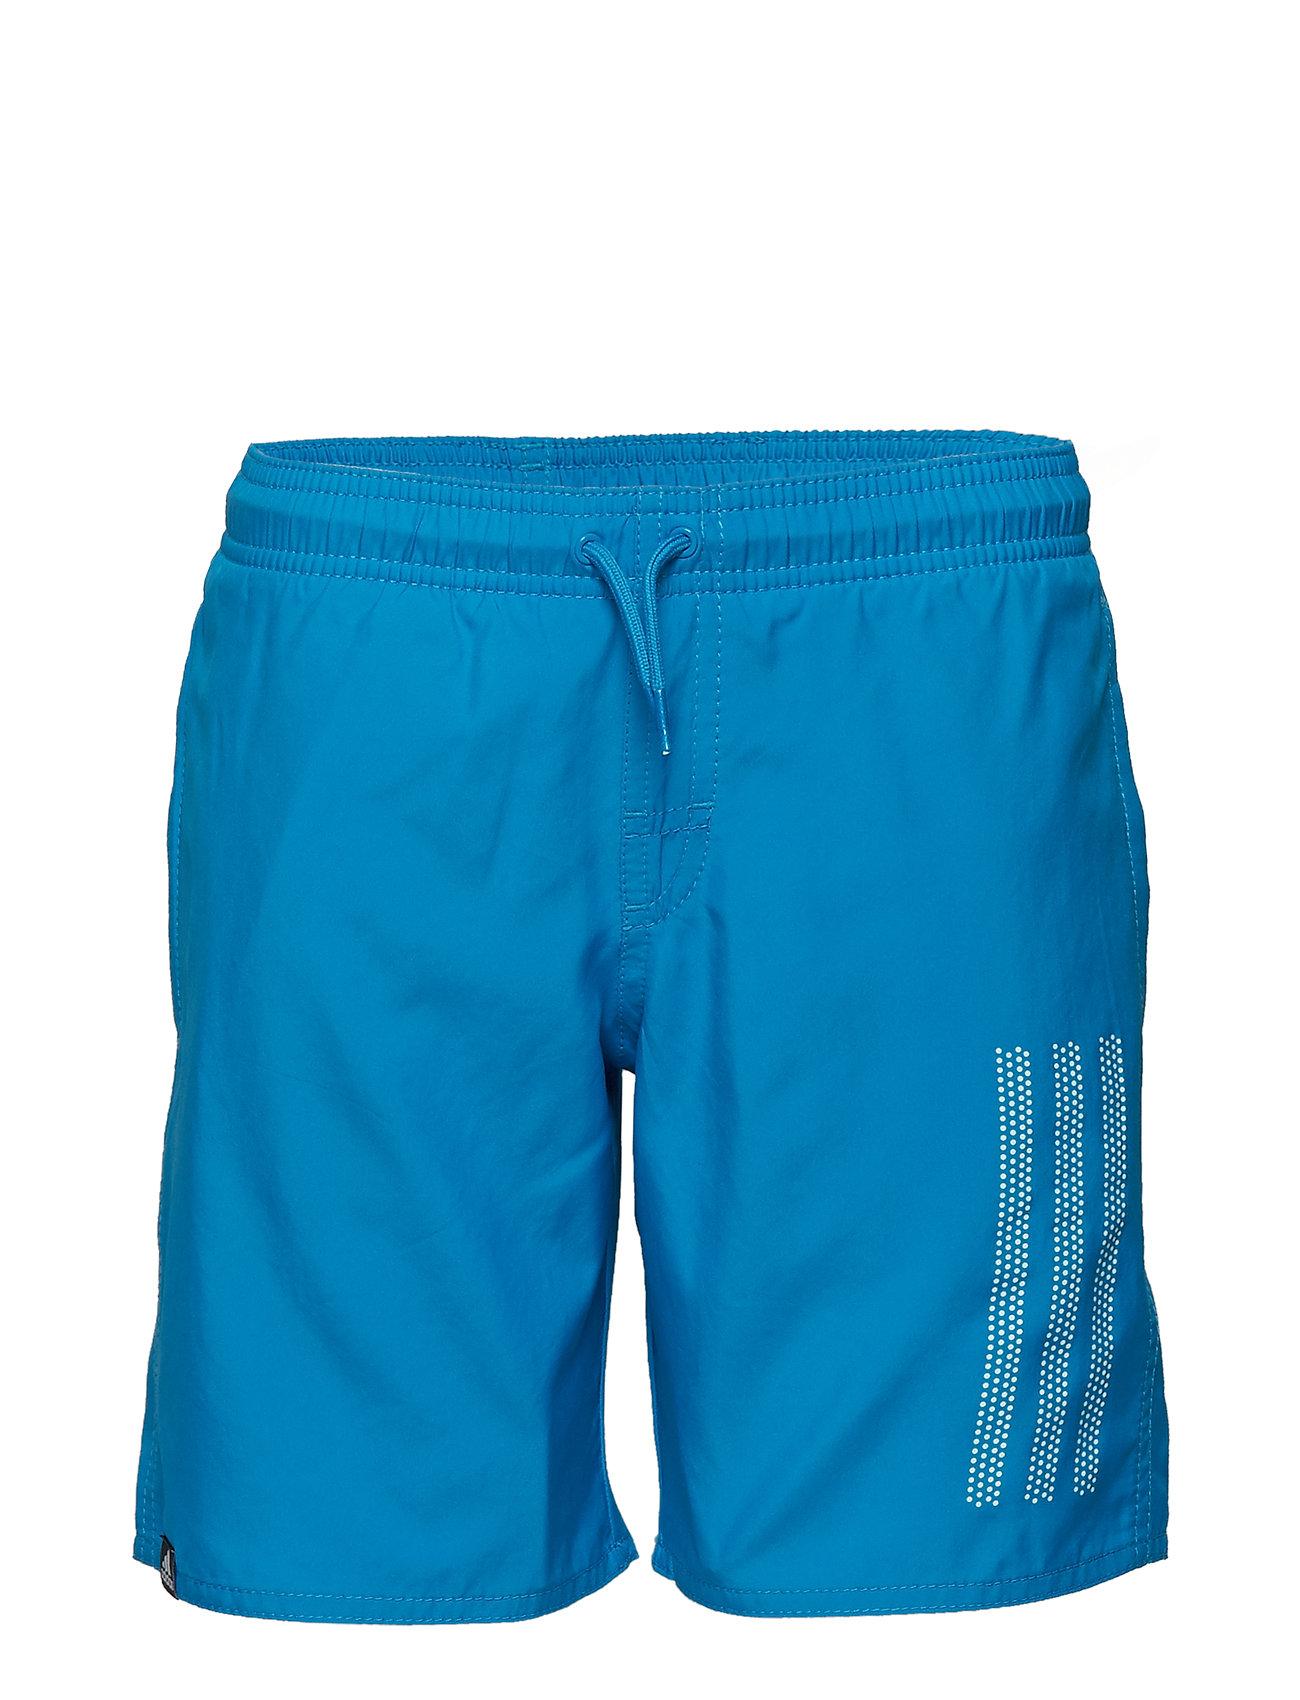 69c86655468cce Yb 3s Sh Cl badeshorts fra Adidas til børn i Sort - Pashion.dk